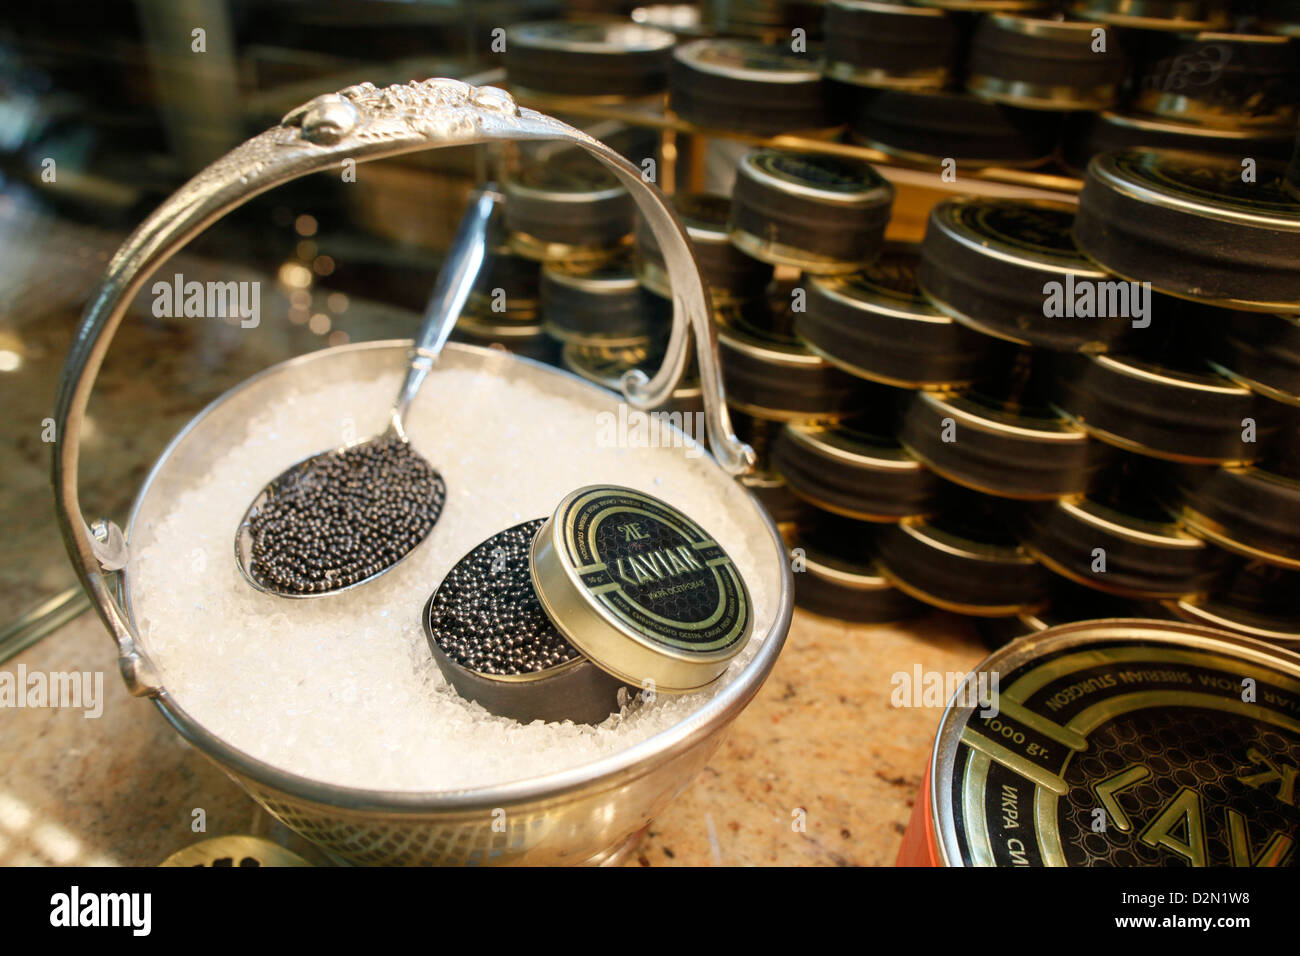 Russian caviar, St. Petersburg, Russia, Europe - Stock Image